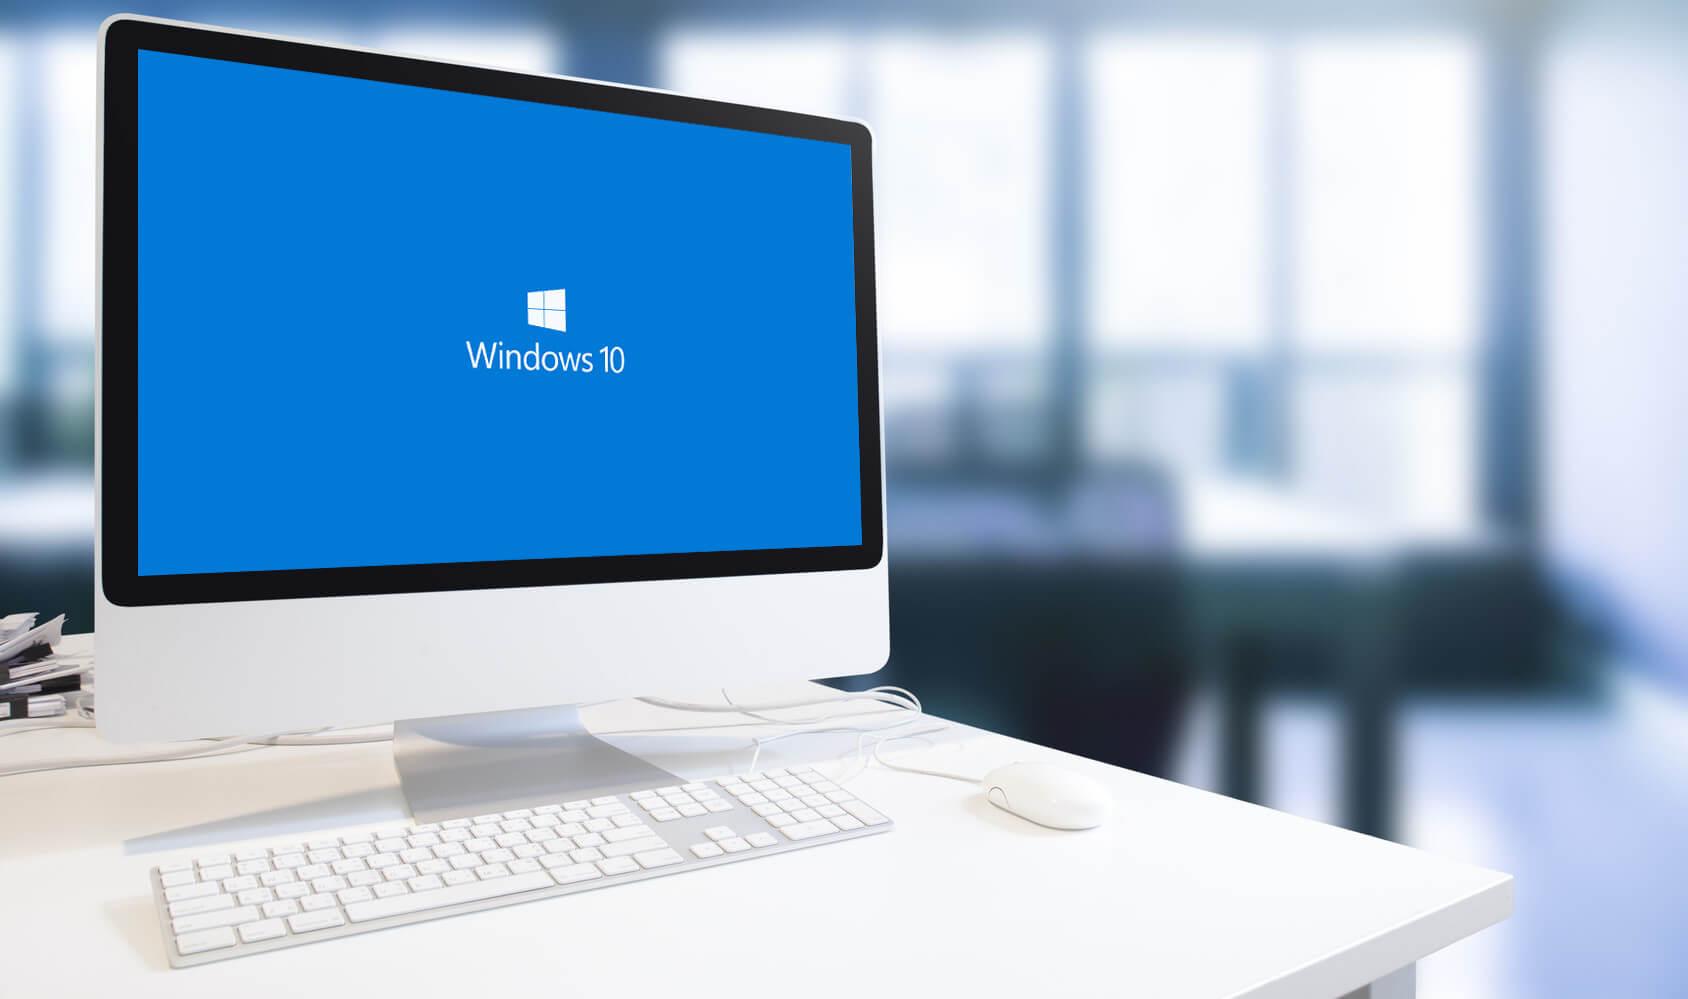 Verbreitung Windows 10